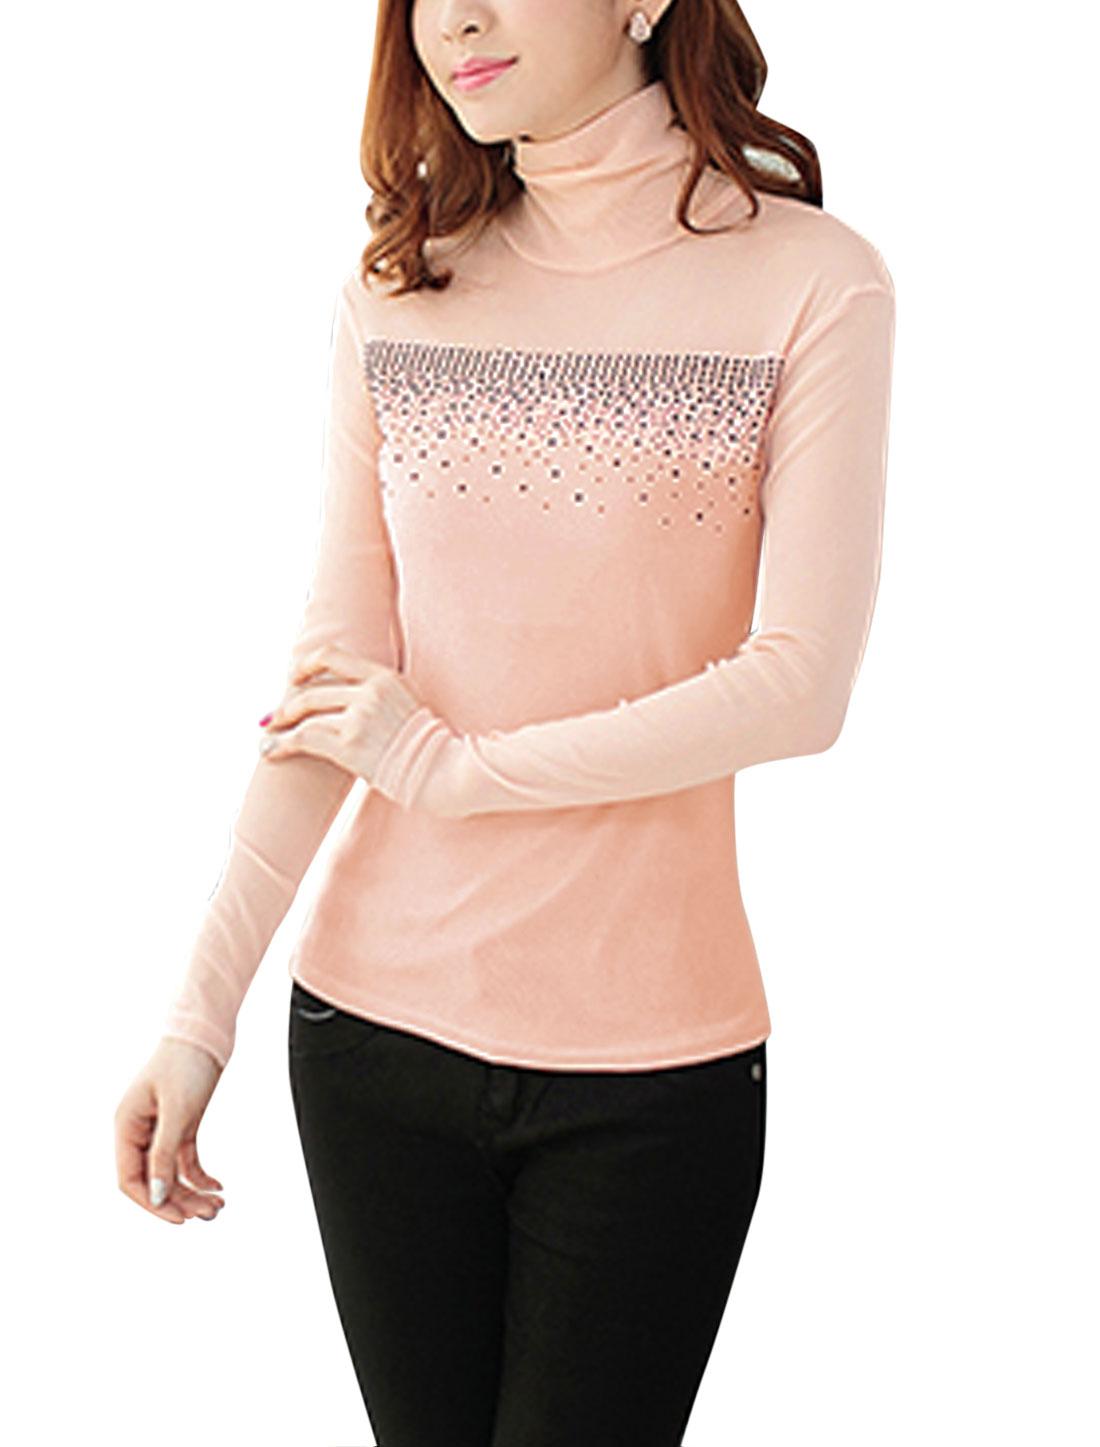 Women Slipover Beaded Embellished Long Sleeve Top Light Pink M